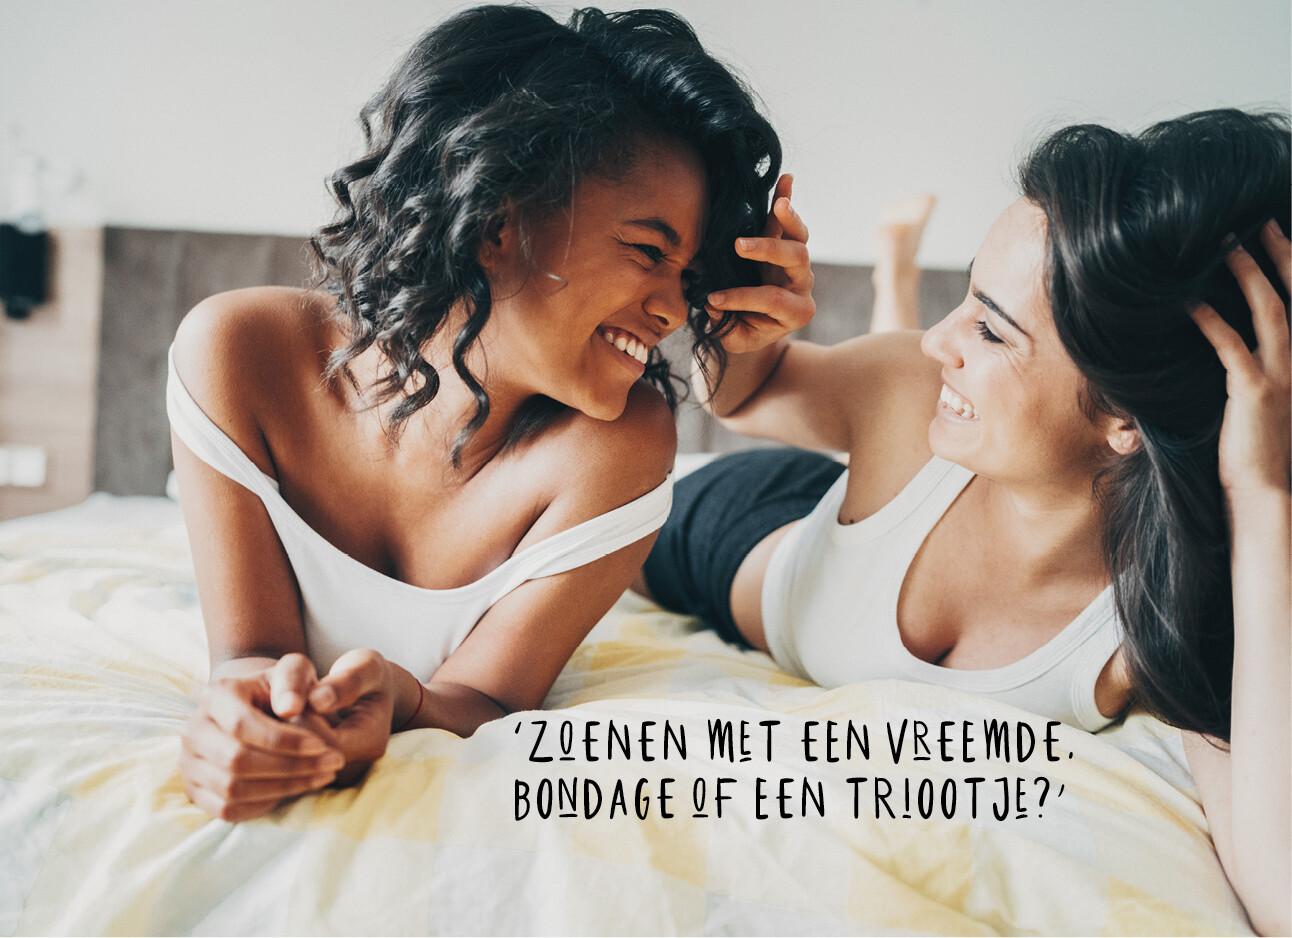 twee vrouwen lachend in bed